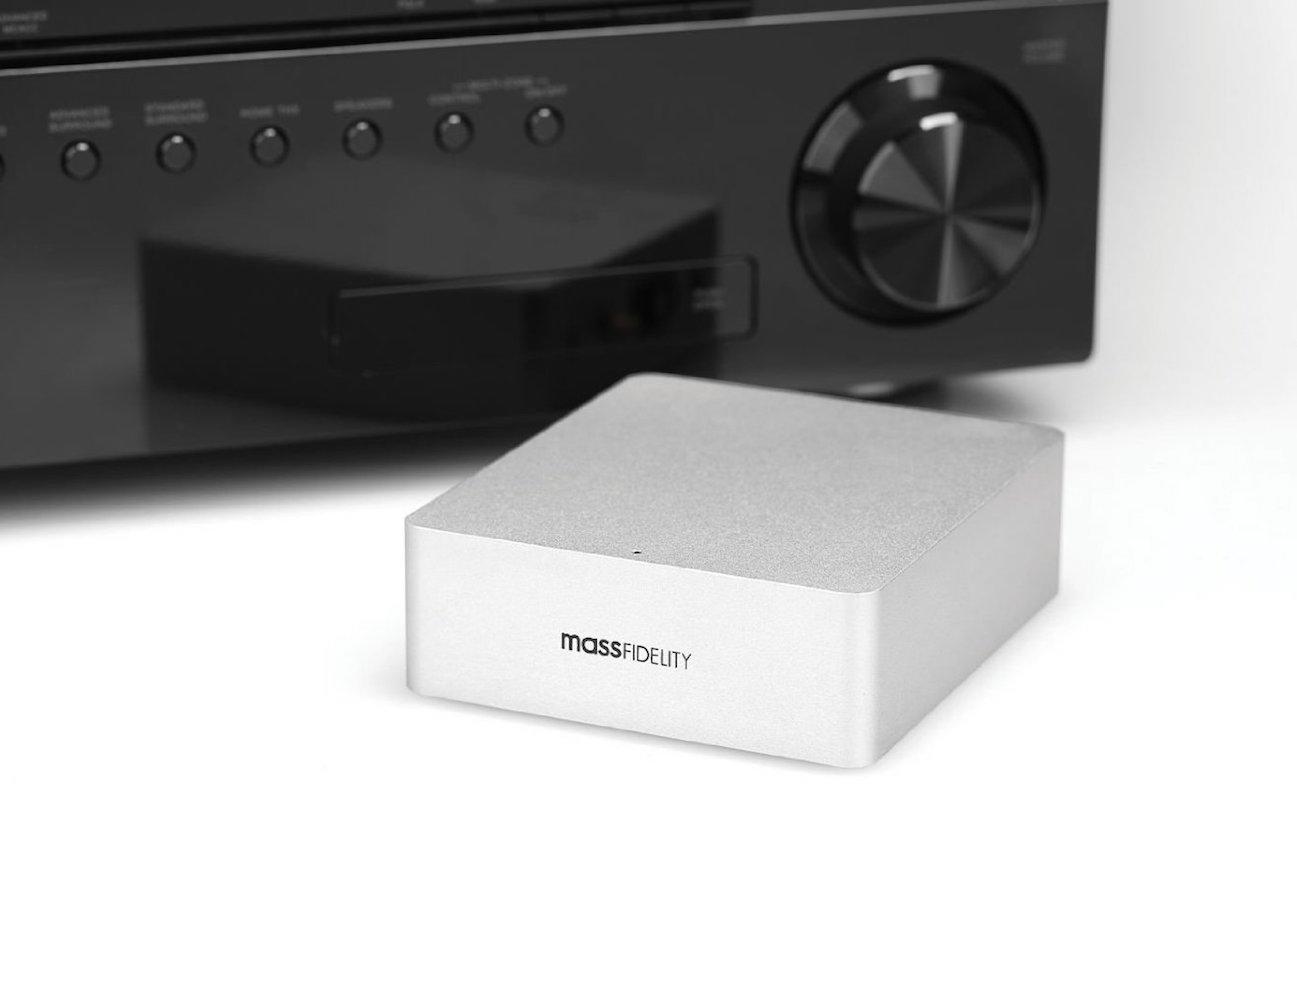 Relay Hi-Fi Bluetooth DAC From Mass Fidelity